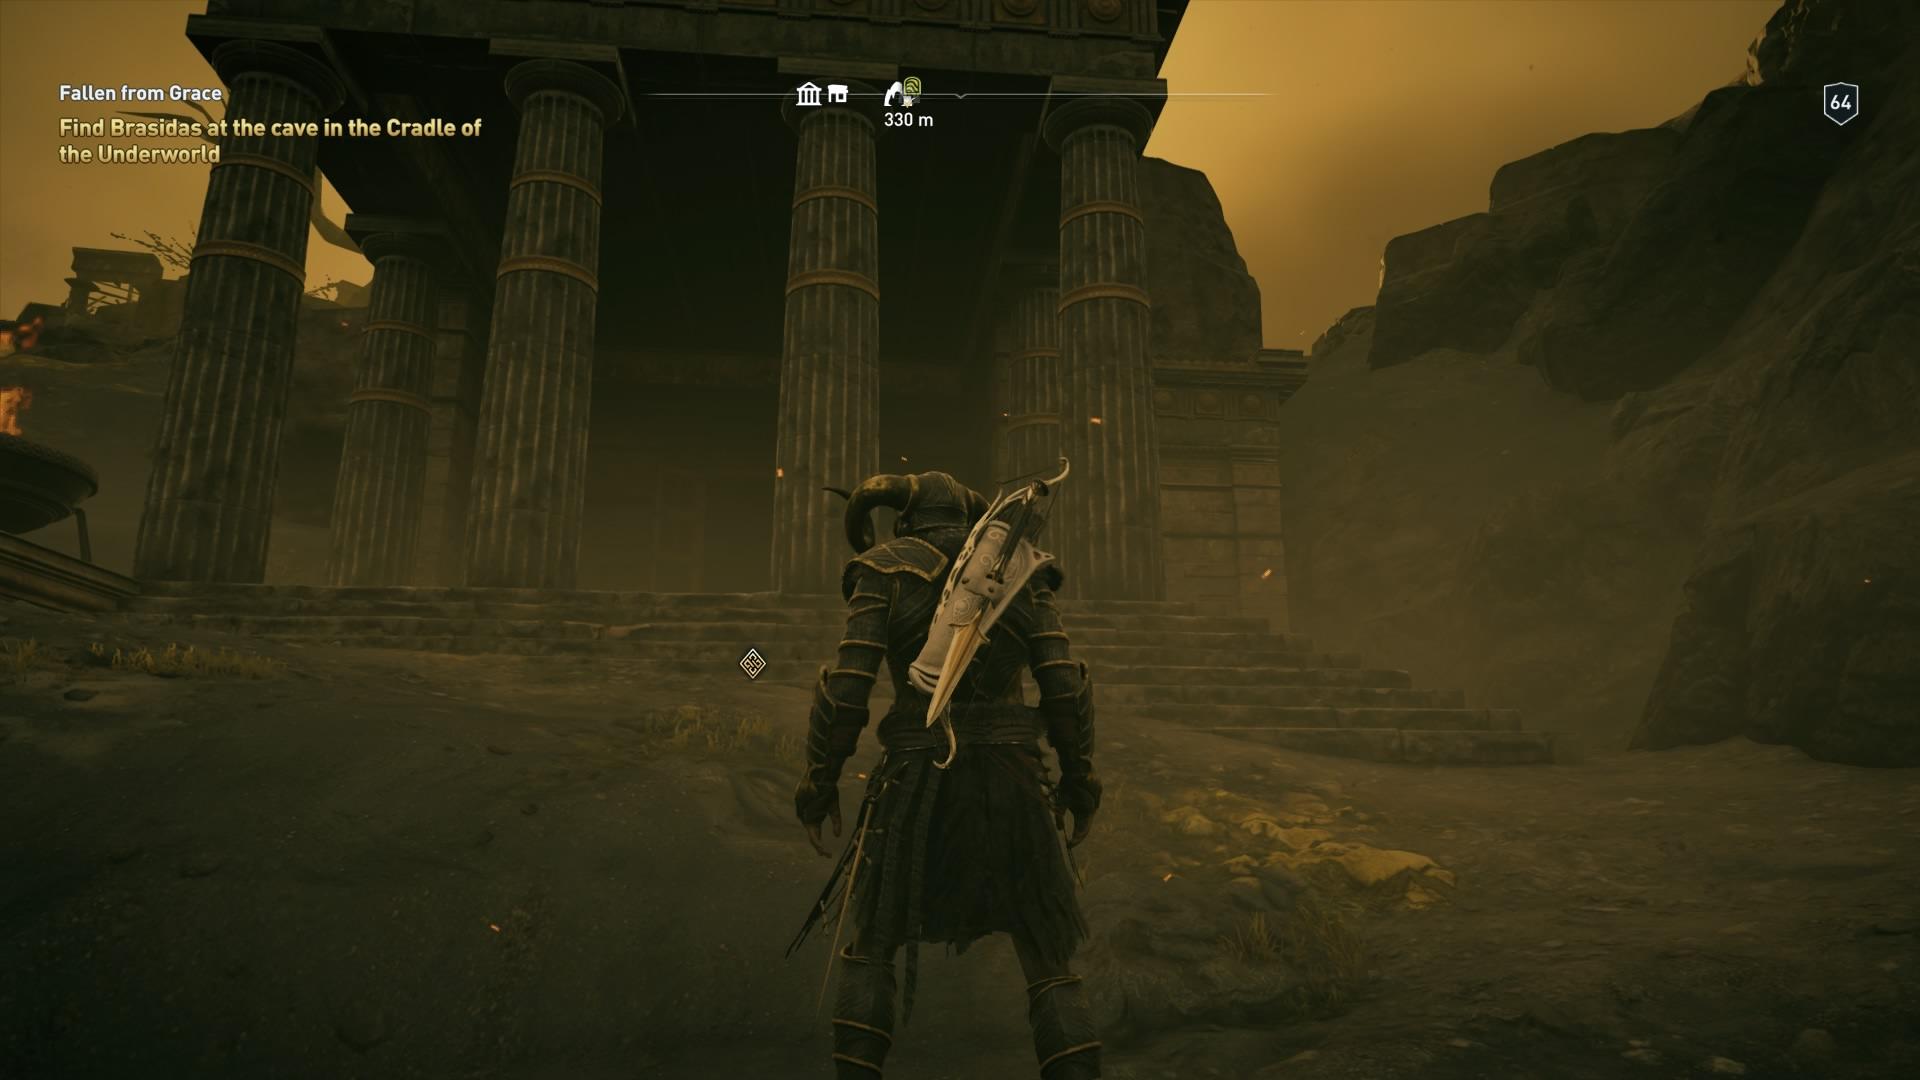 Fallen From Grace: Assassin's Creed Odyssey Walkthrough